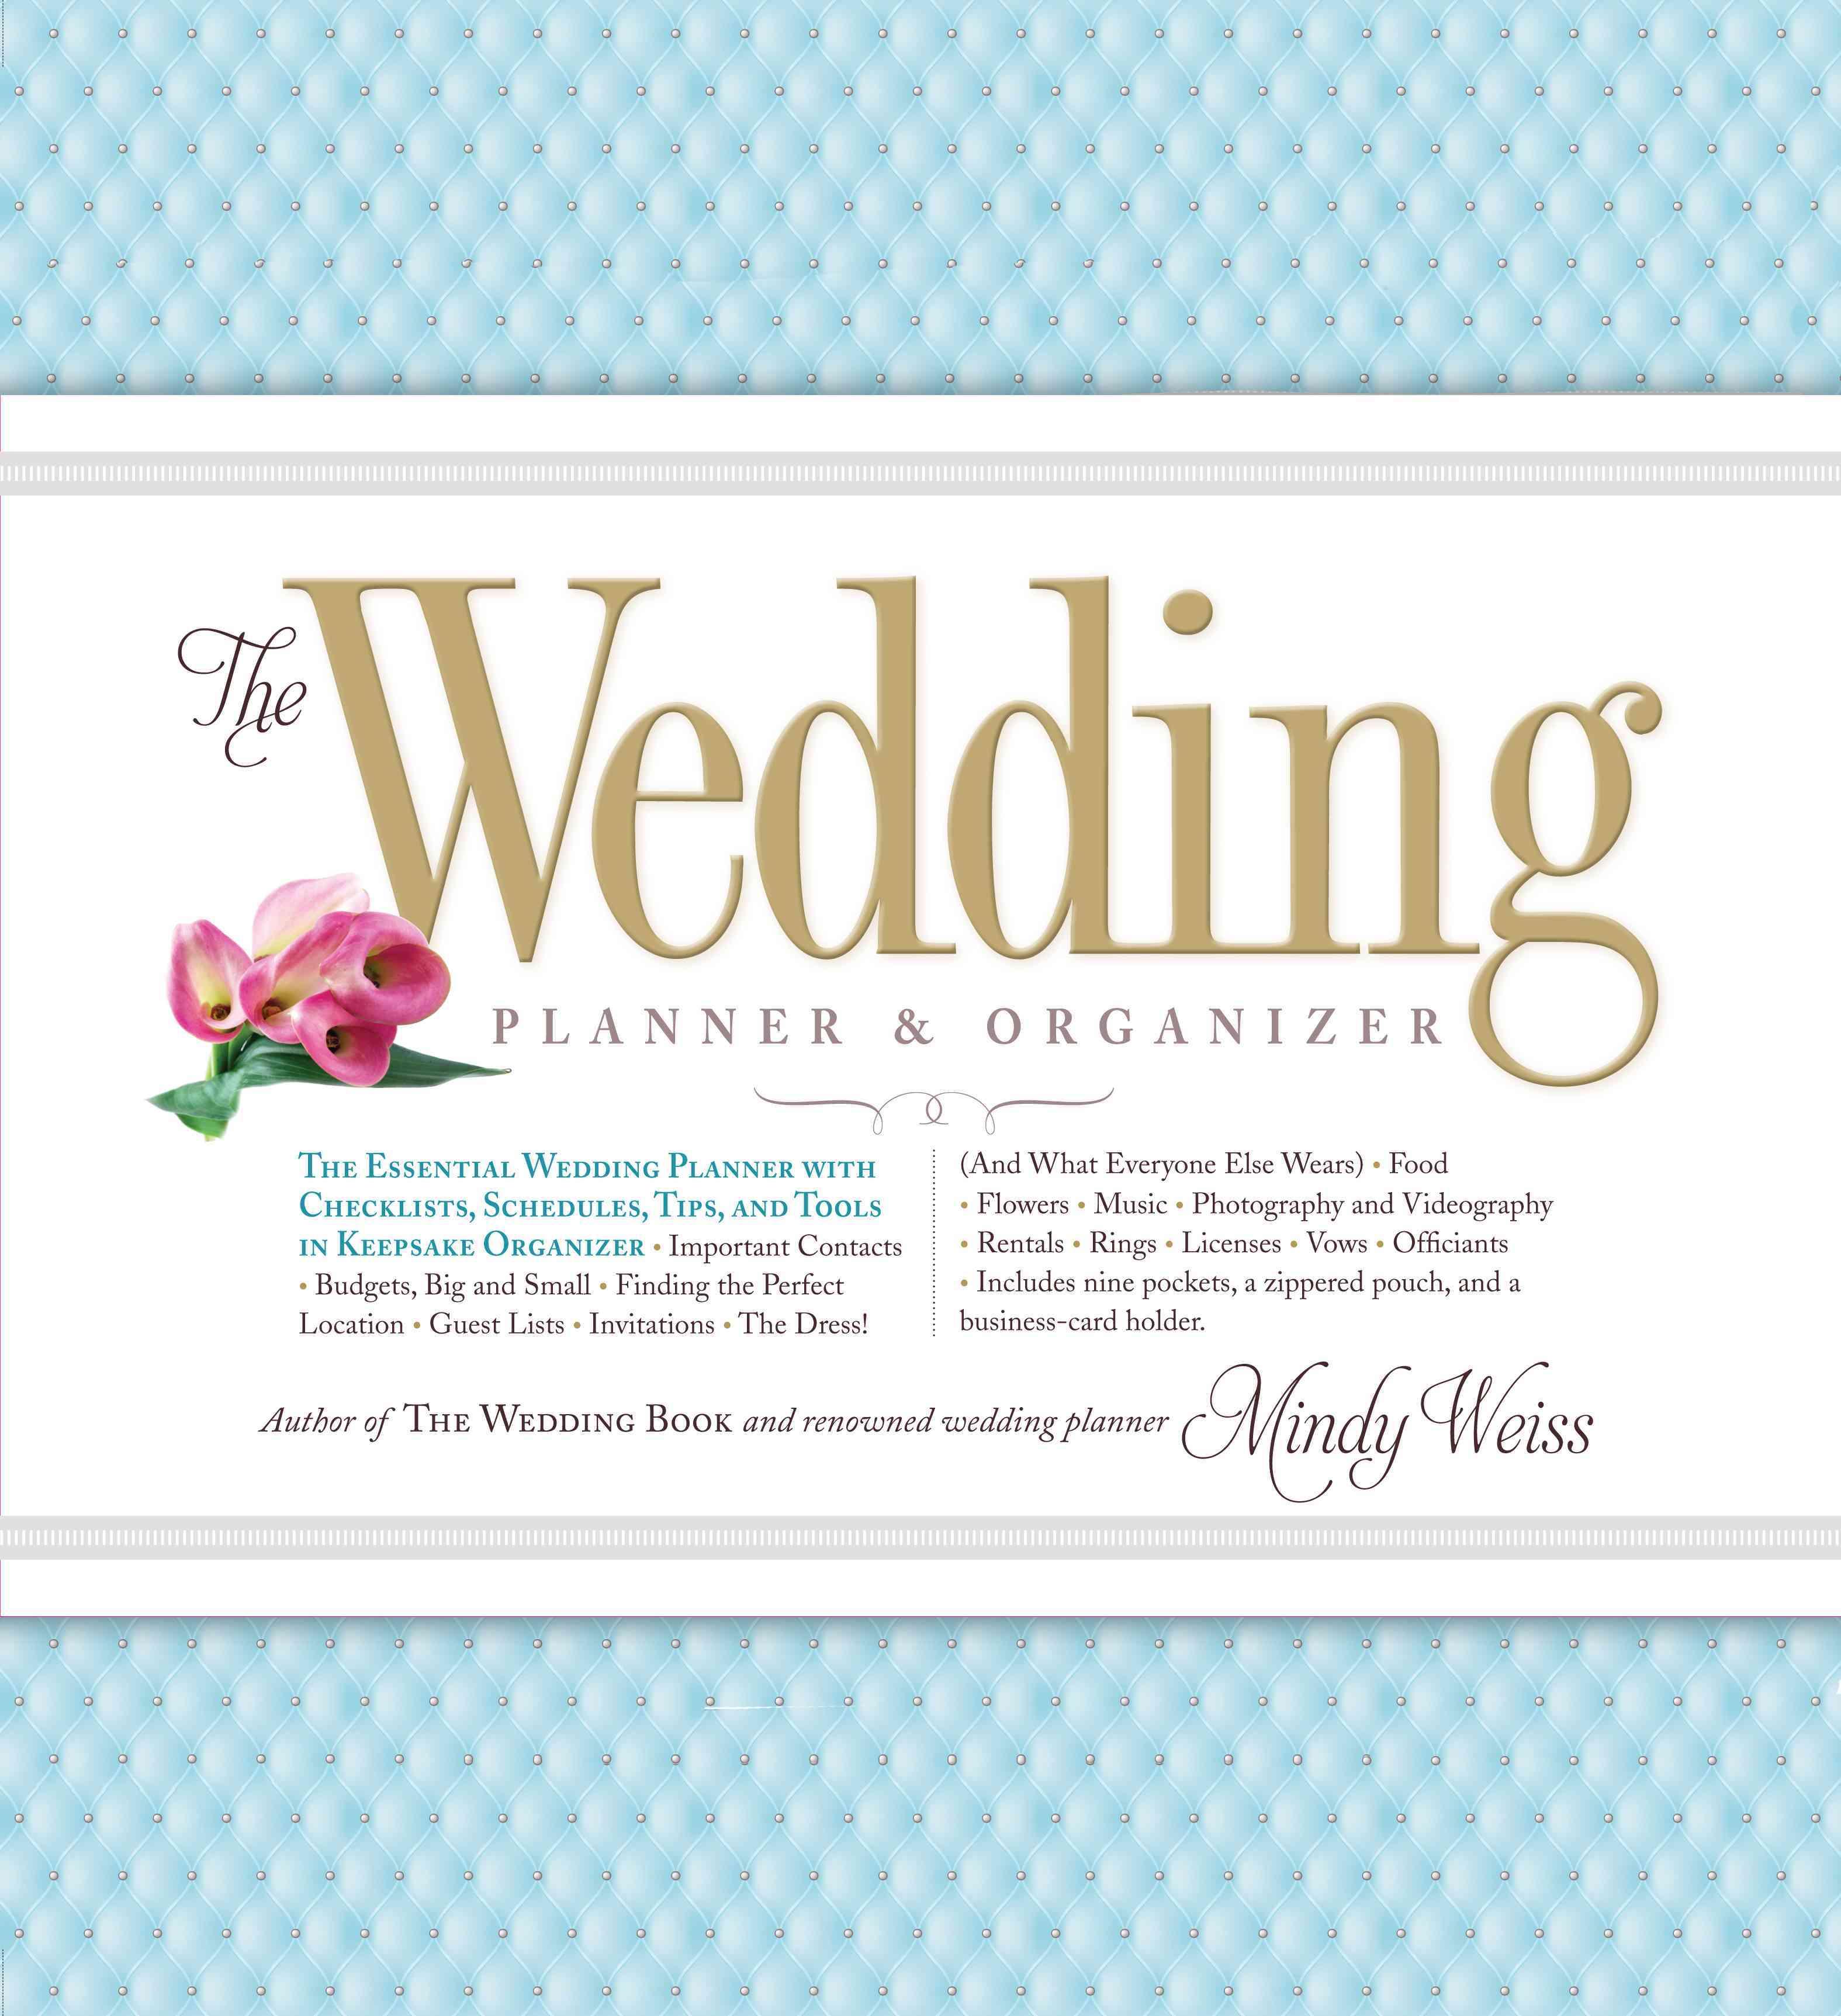 The Wedding Planner & Organizer (Hardcover)